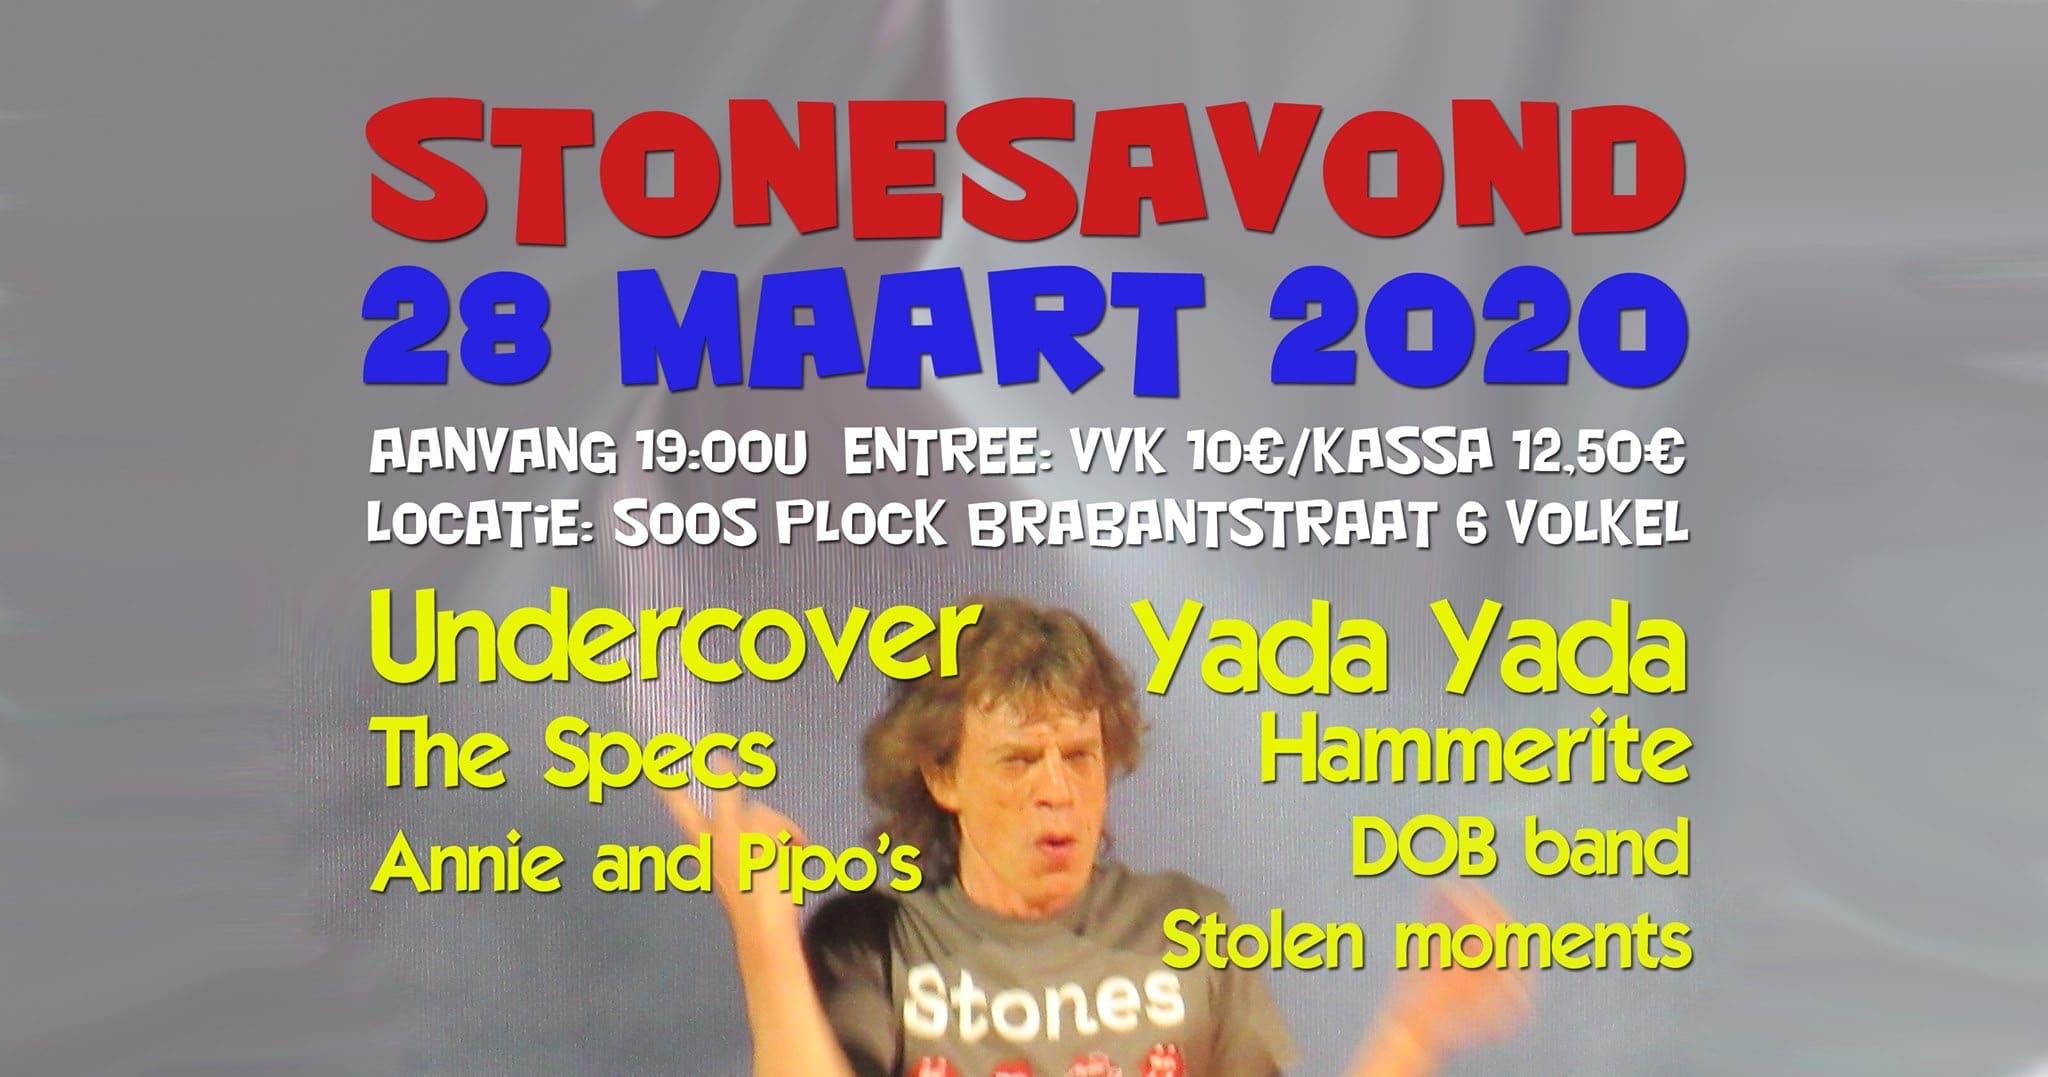 Zaterdag 28 maart Stonesavond in Soos Plock